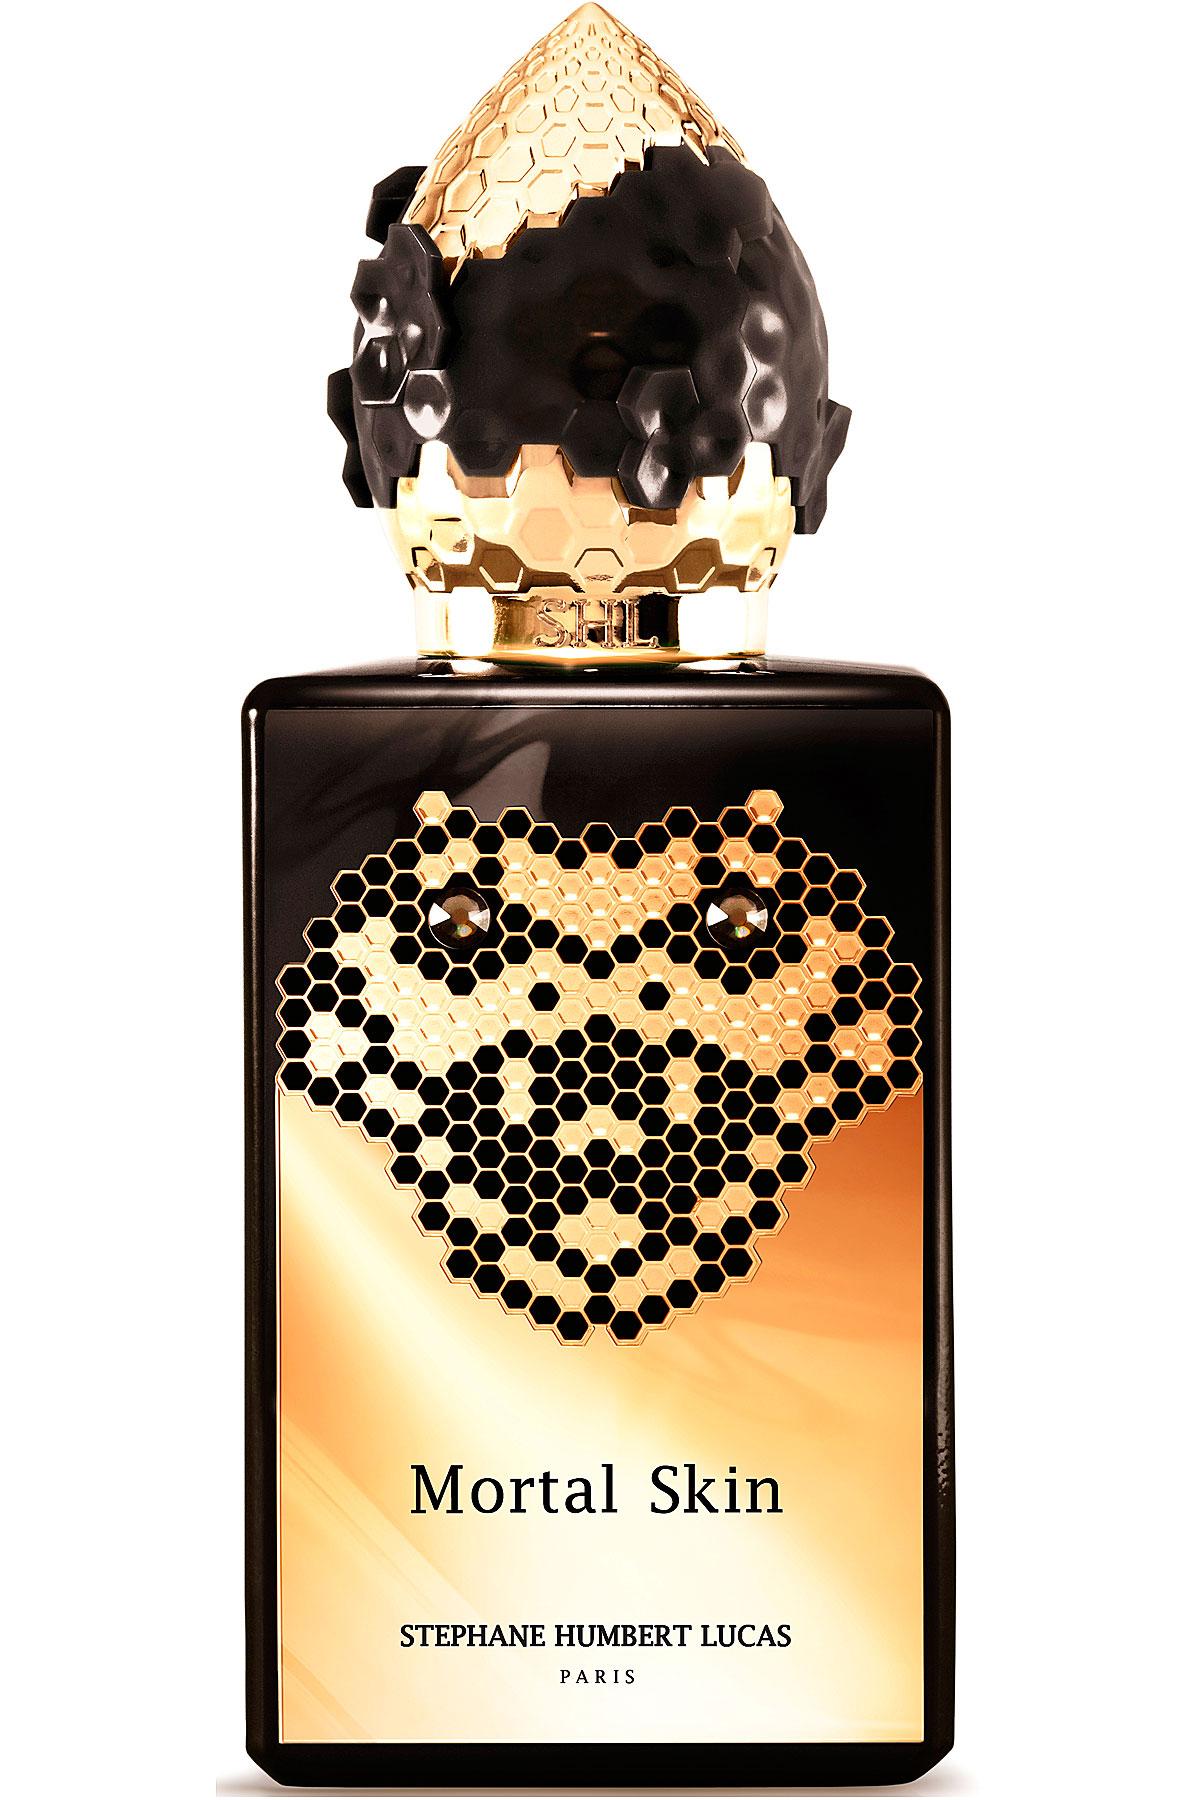 Stephane Humbert Lucas 777 Paris Fragrances for Women, Mortal Skin - Eau De Parfum - 50 Ml, 2019, 50 ml